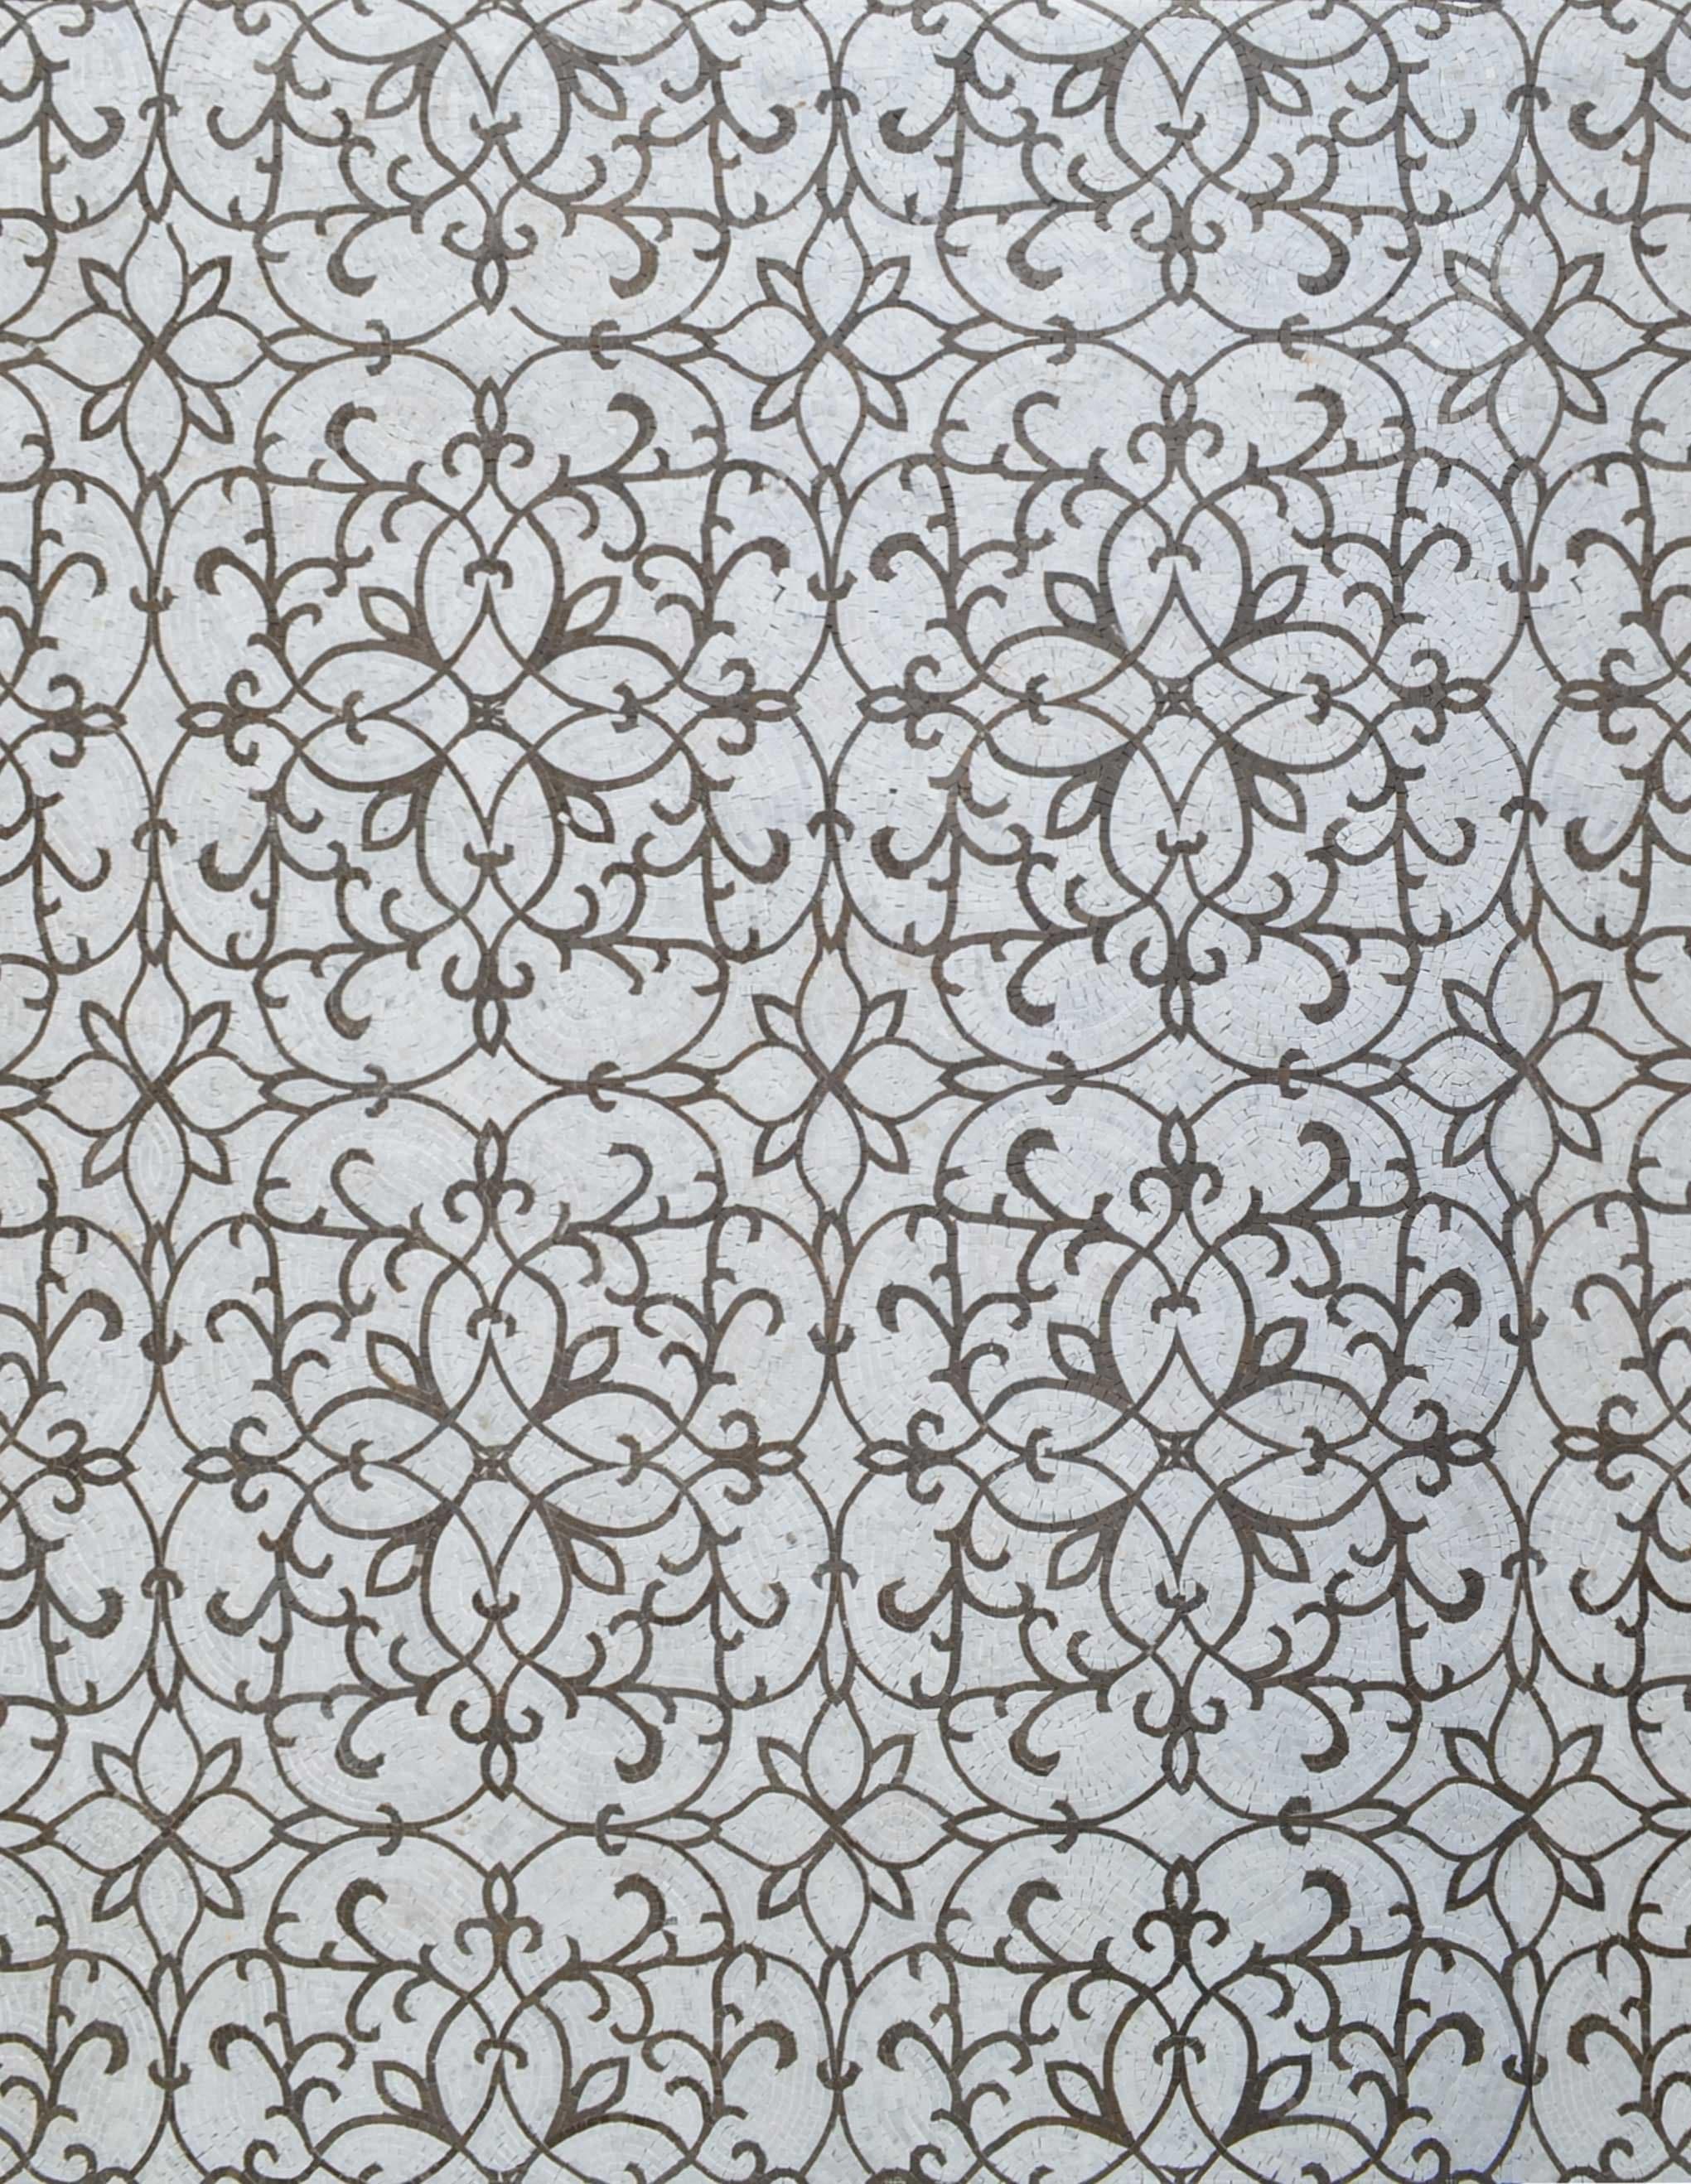 Rummy Patterned Floral Design On Marble Mosaic Tile Art Patterned Floral Design On Marble Mosaic Tile Art Patterns Mozaico Marble Mosaic Tile Hexagon Marble Mosaic Tiles Perth houzz 01 Marble Mosaic Tile